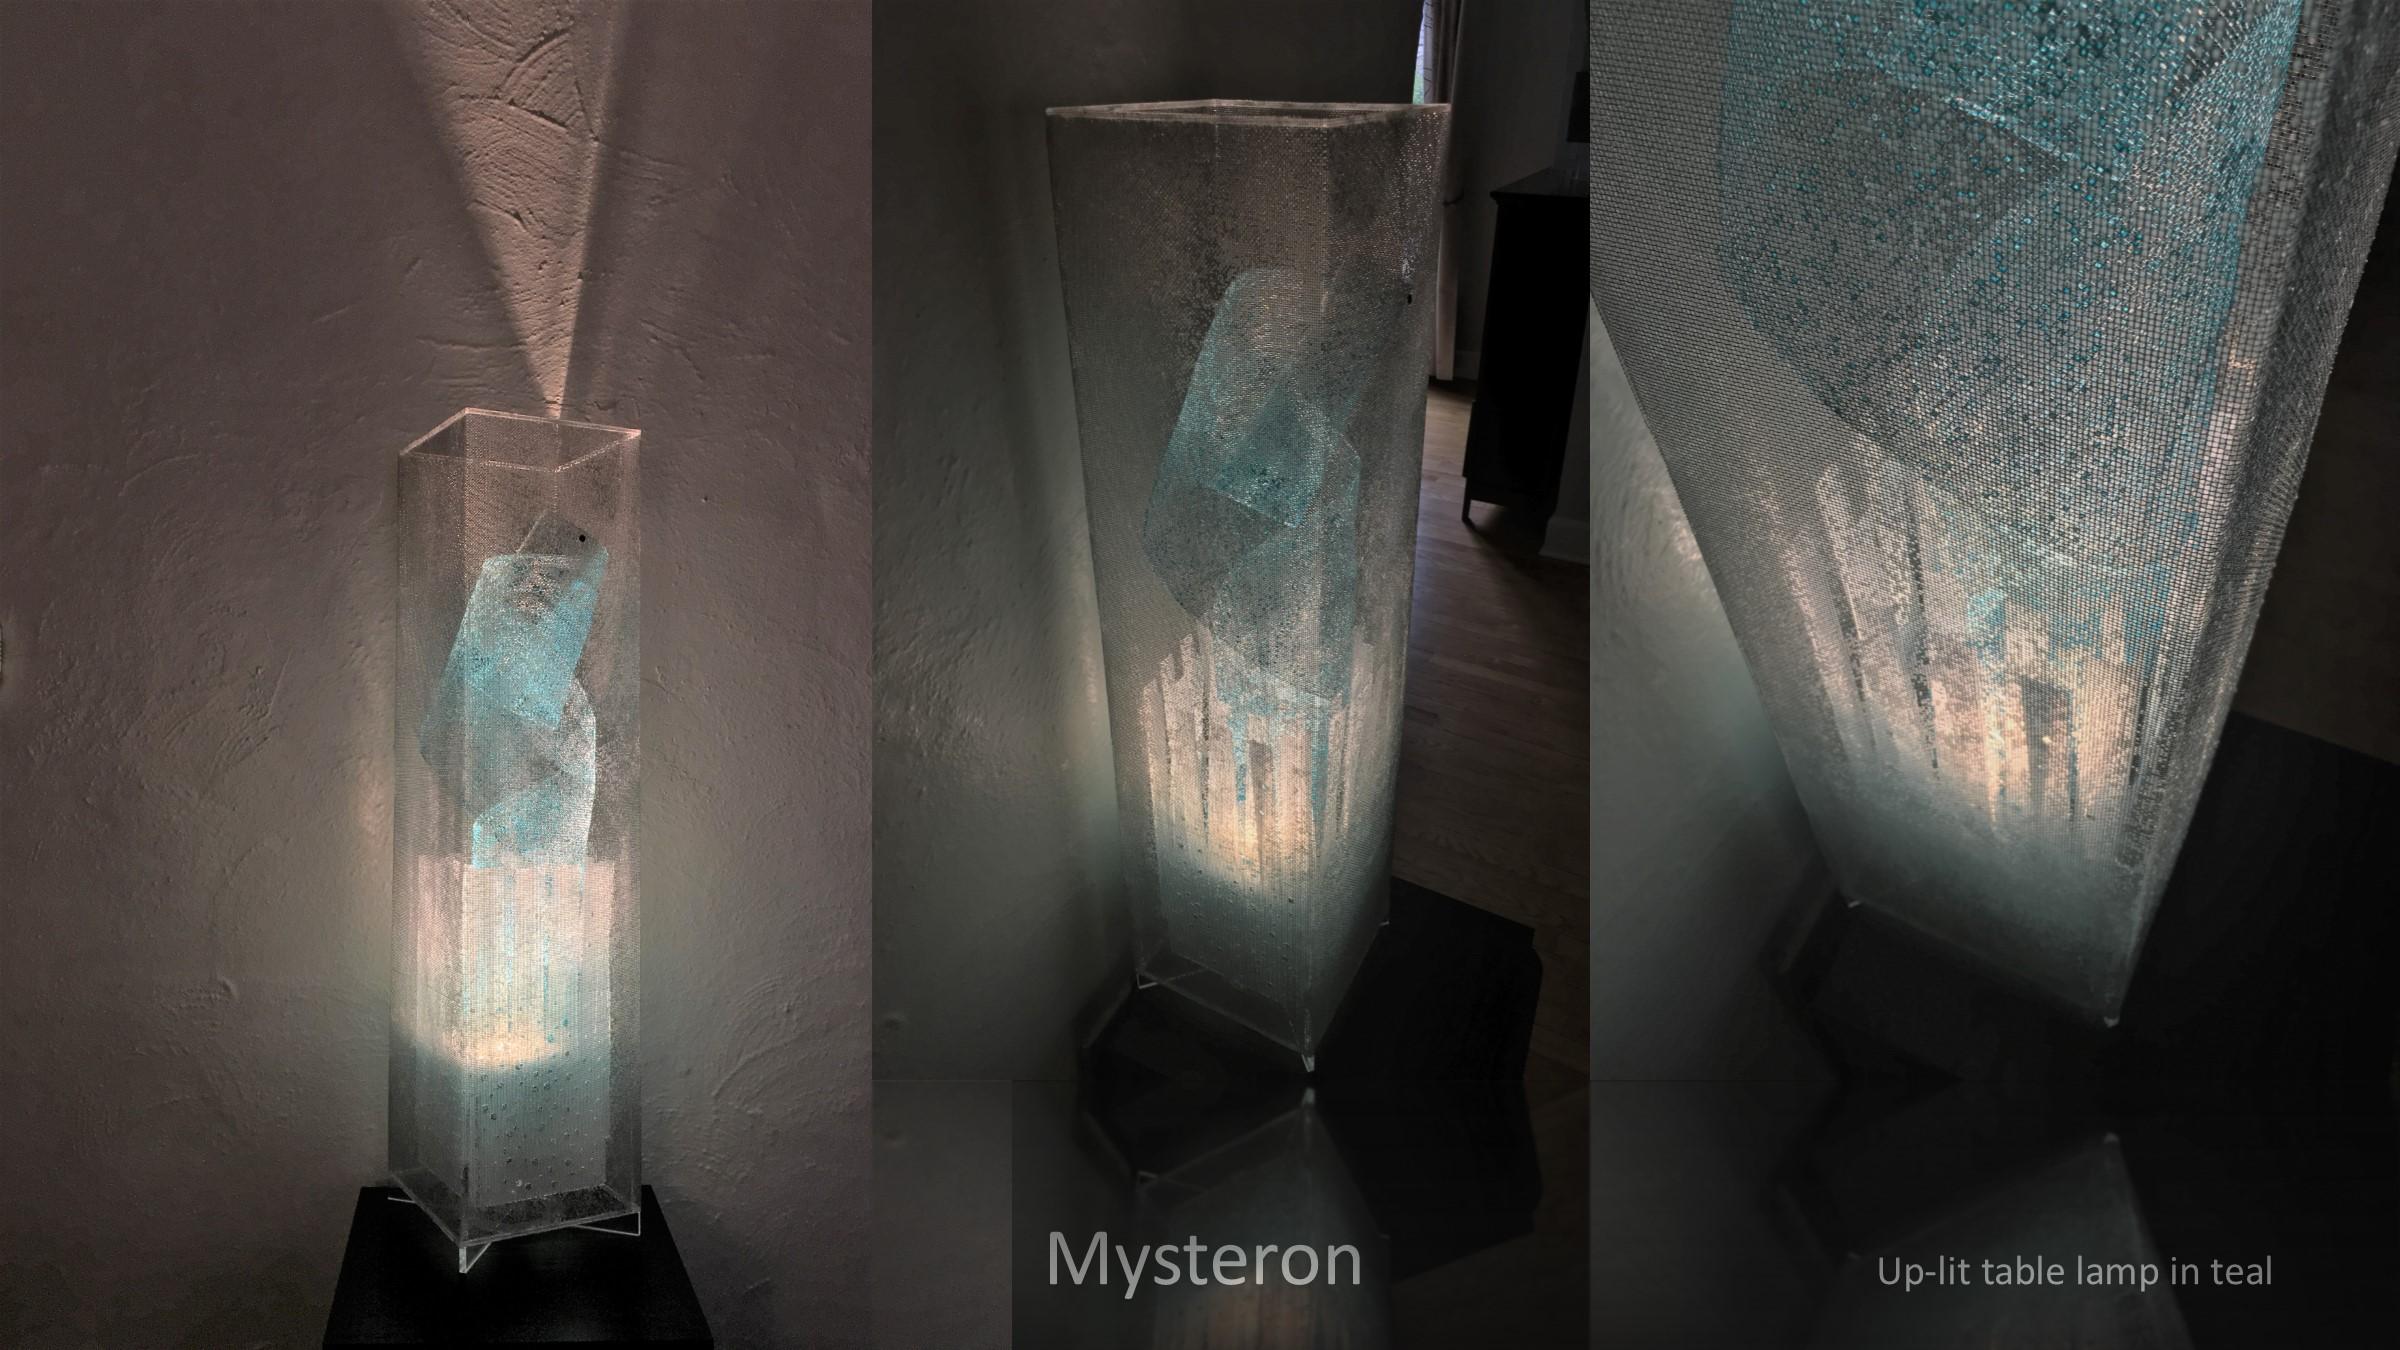 007.5_Mysteron-Teal_19-03-22.jpg